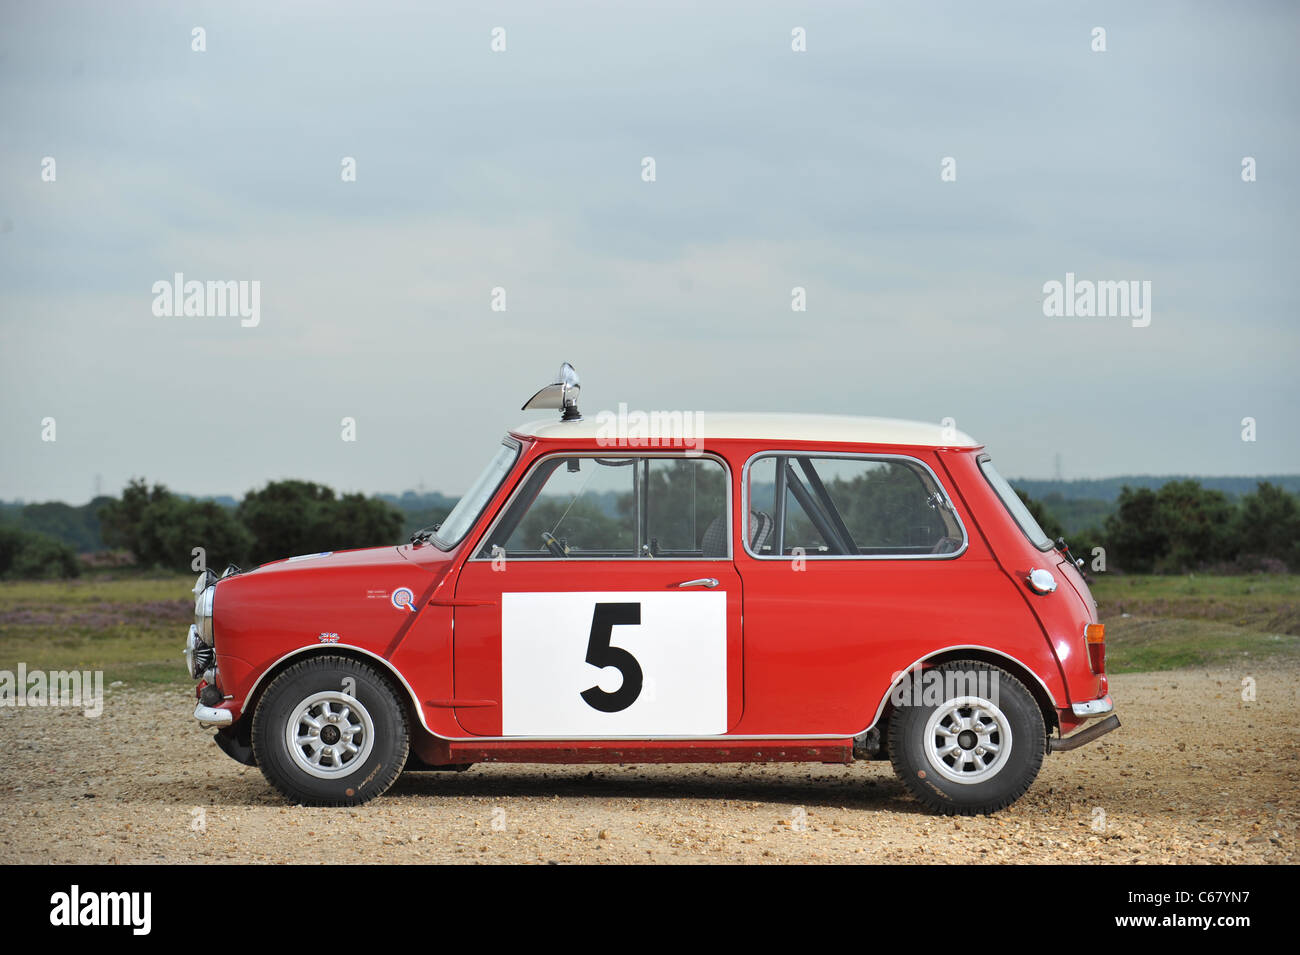 1964 mini cooper 1,275s rally saloon The ex works 1965 rac rally and  1966 scottish winner - Stock Image